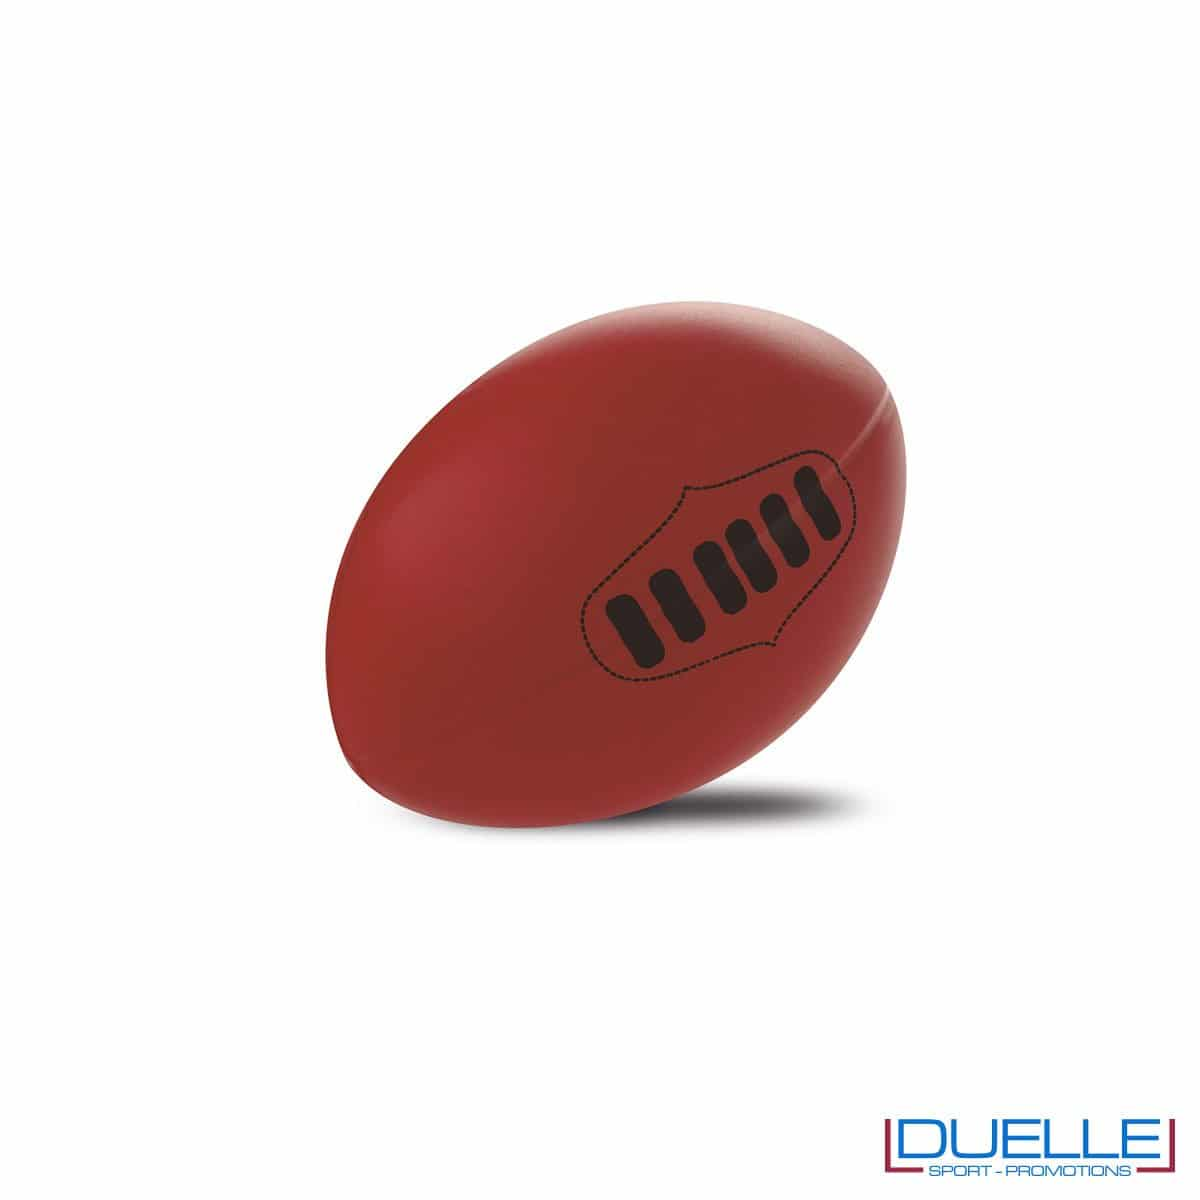 Pallone Rugby Antistress personalizzabile con stampa